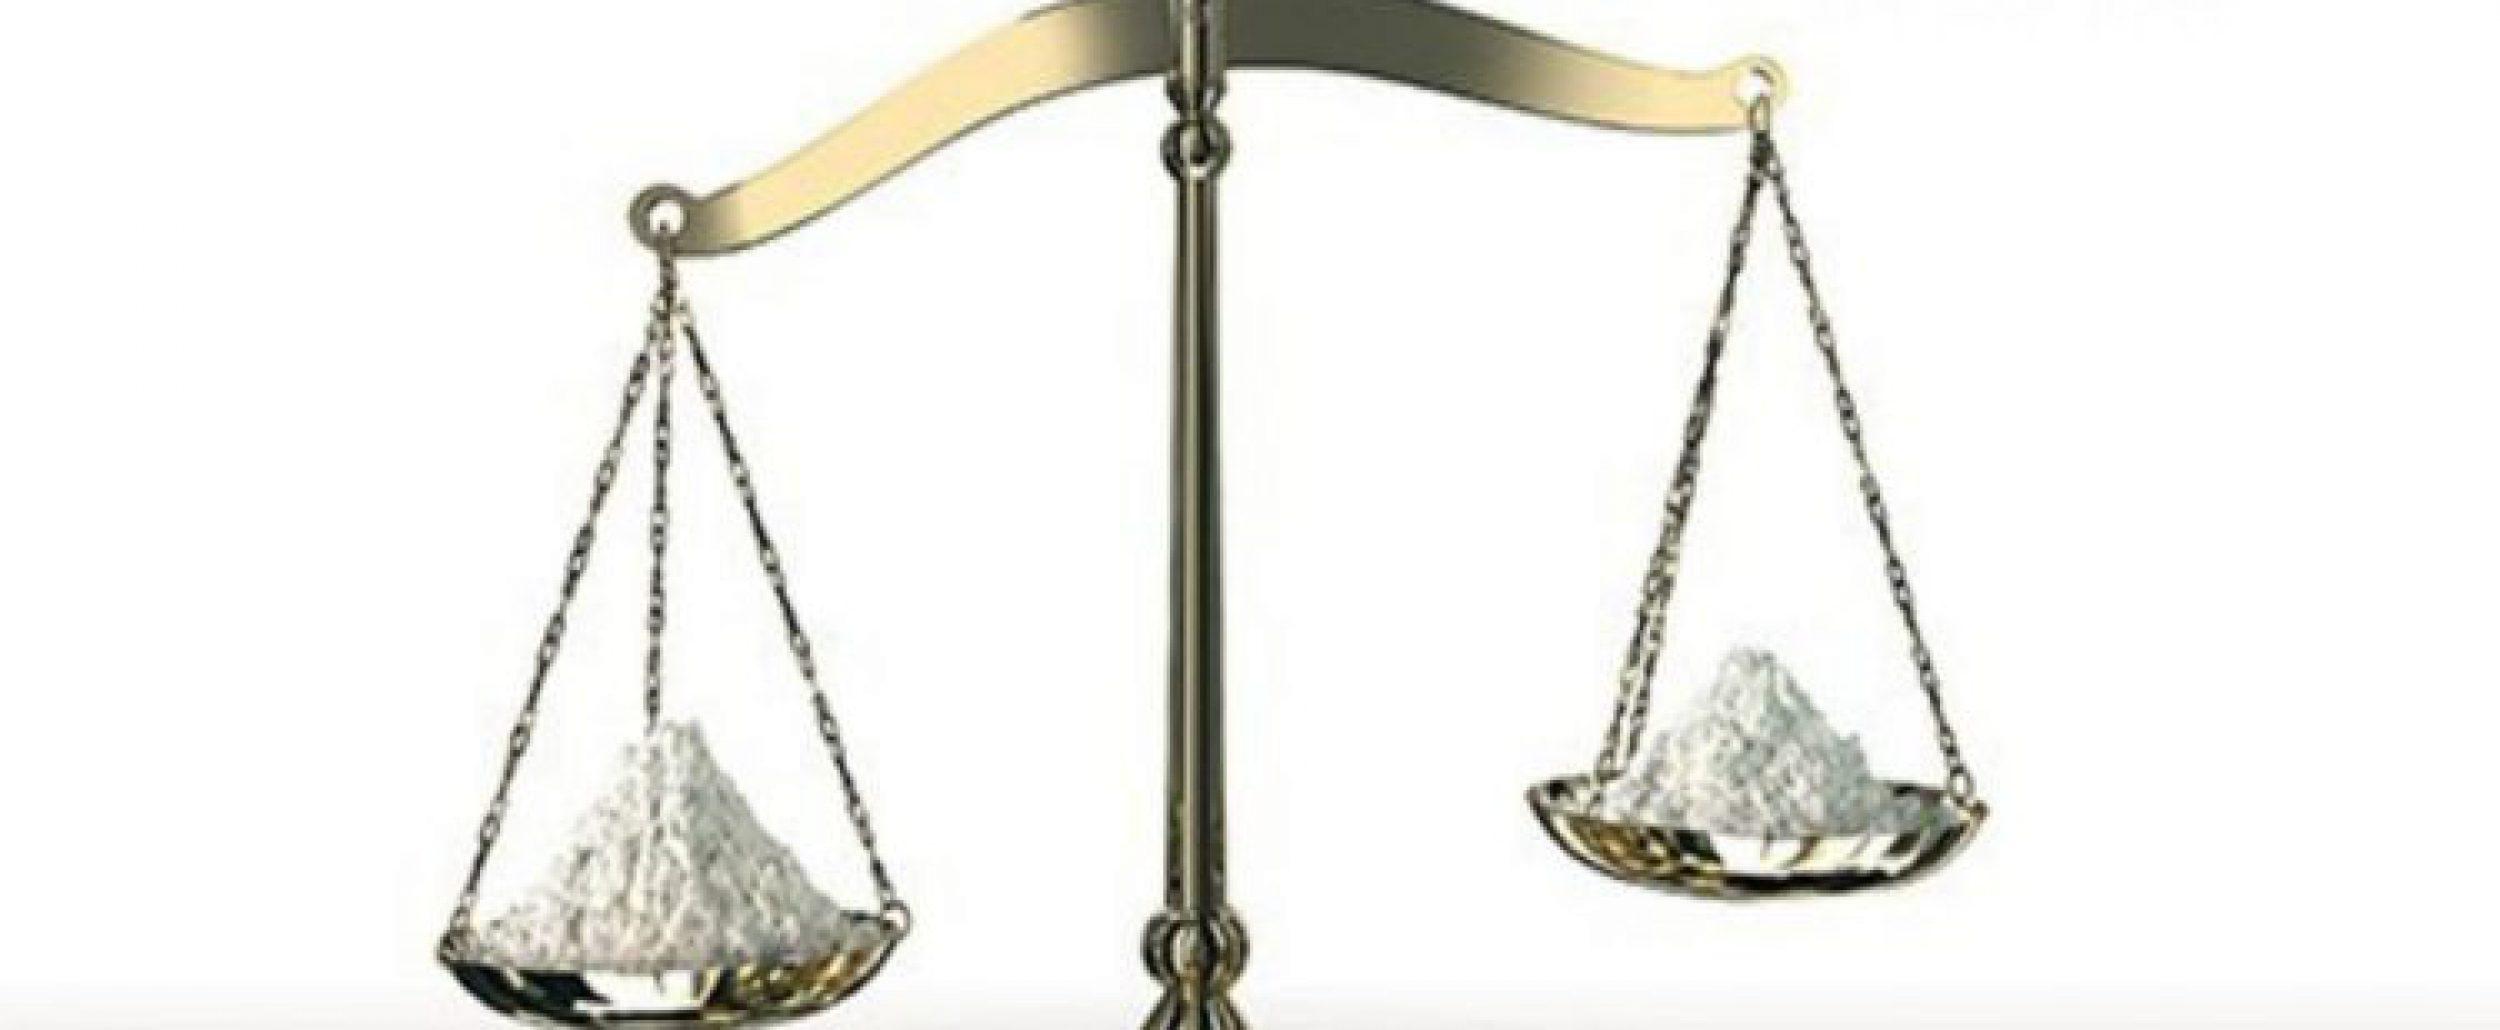 Legal Metrology Certificate